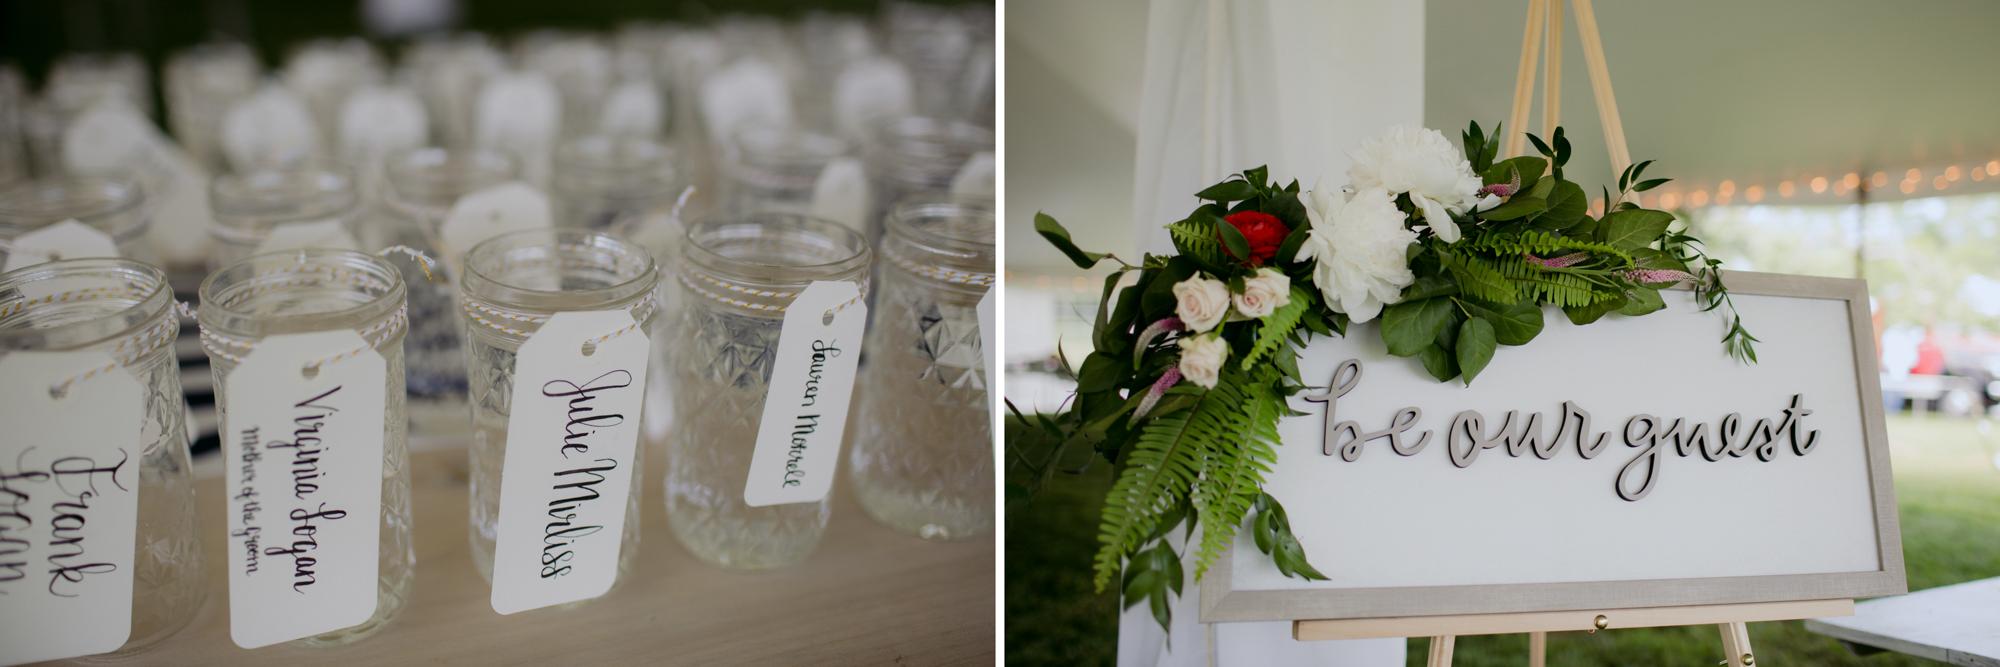 Livewell_Farm_wedding_Harpswell_maine_Meghan_Jim_003.jpg